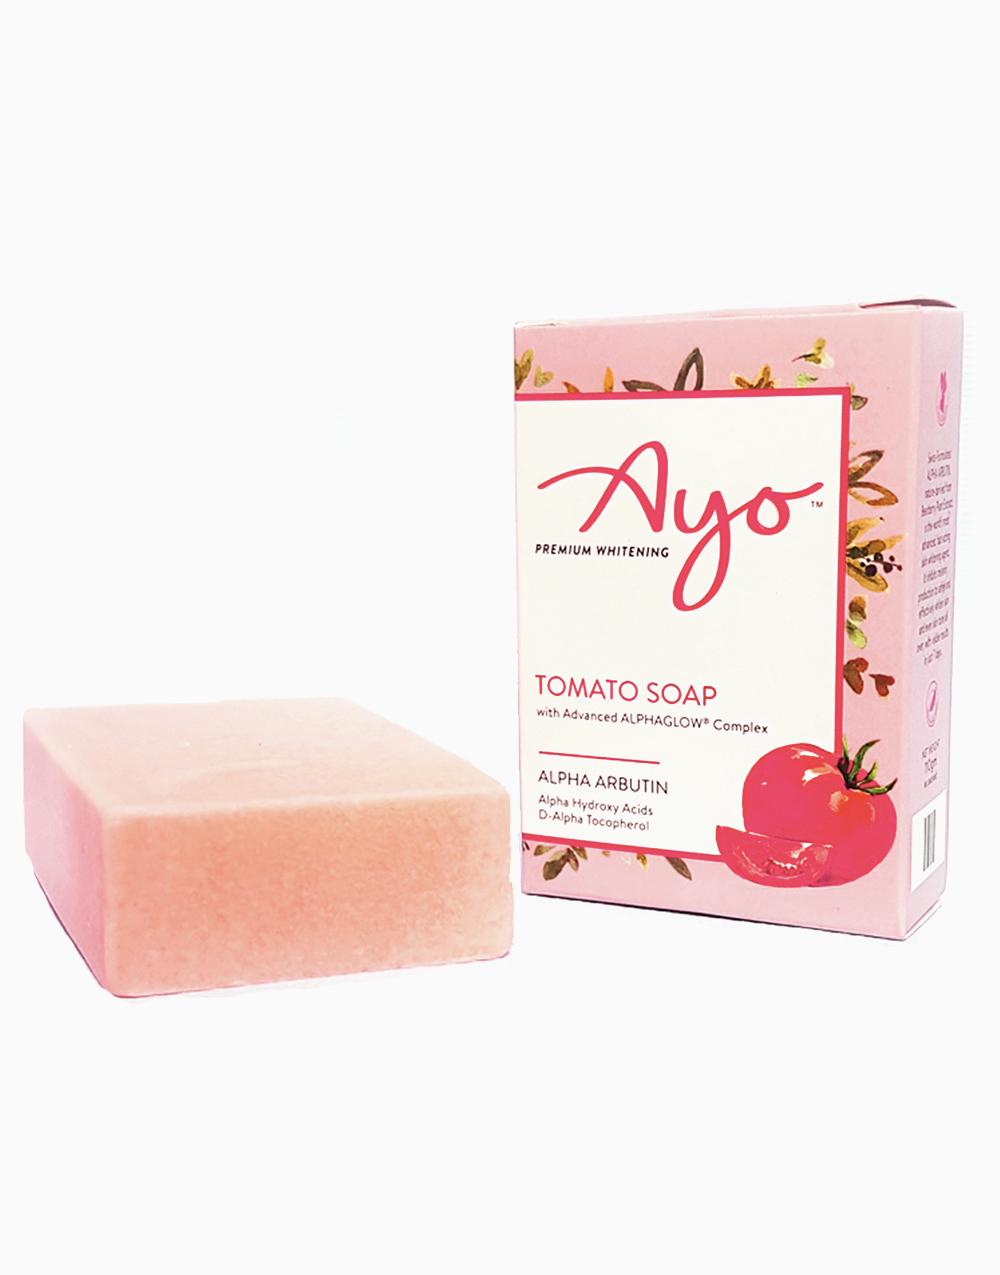 Tomato Soap by Ayo Premium Whitening